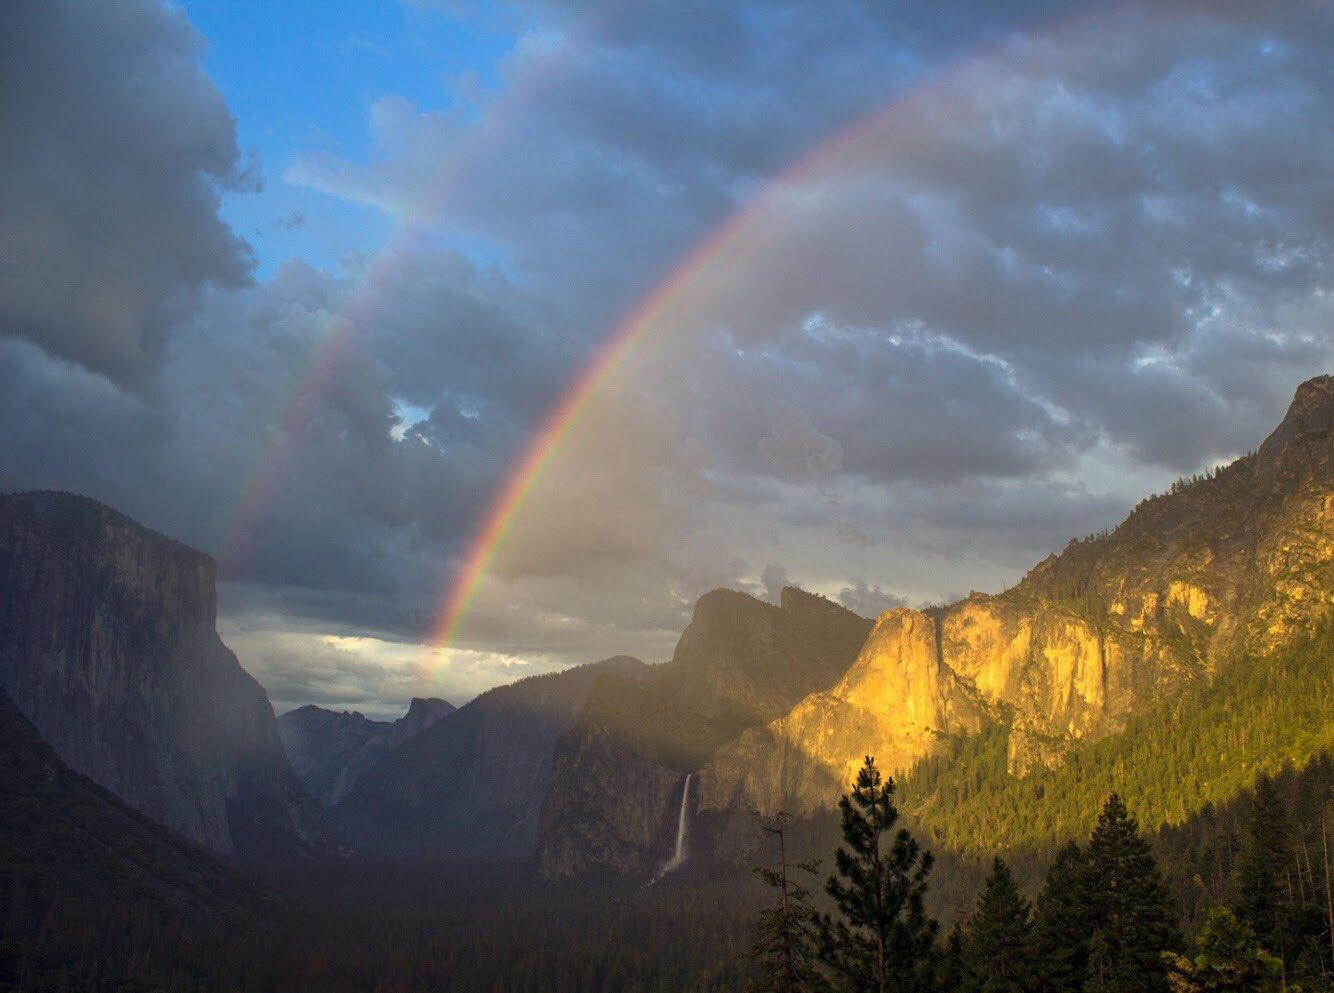 Whoa! Check out this great shot of a double rainbow @YosemiteNPS #California 🌈 https://t.co/QfnshXweSA